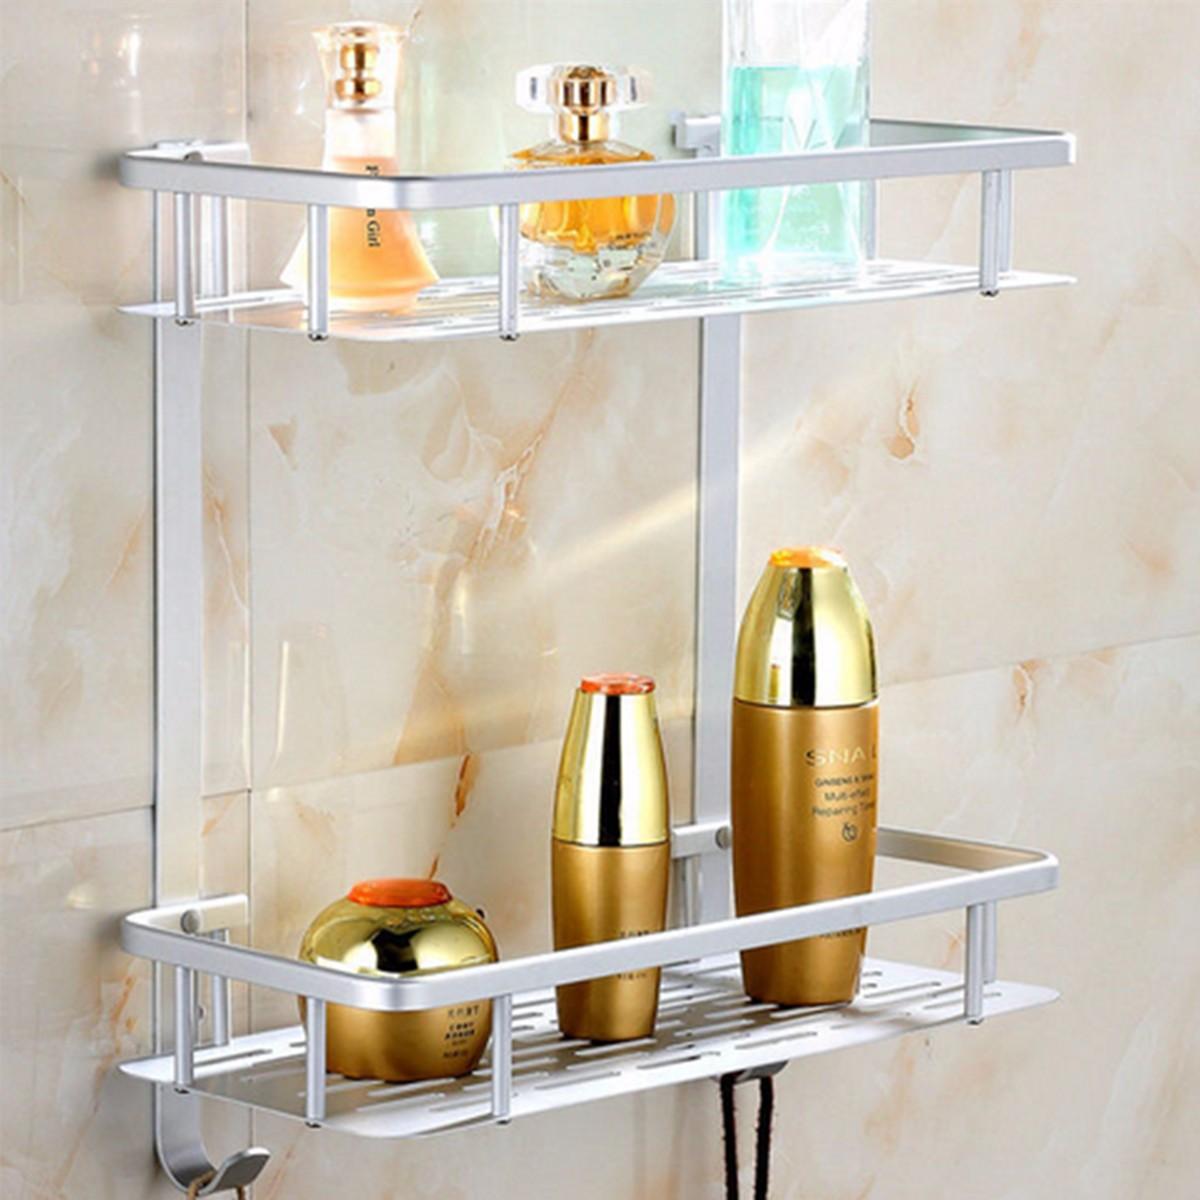 1/2/3 Tiers Aluminium Bathroom Shower Bath Holder Multifunctional Alumimum Shelf Bathroom Rack Utility Storage Organizer Holder